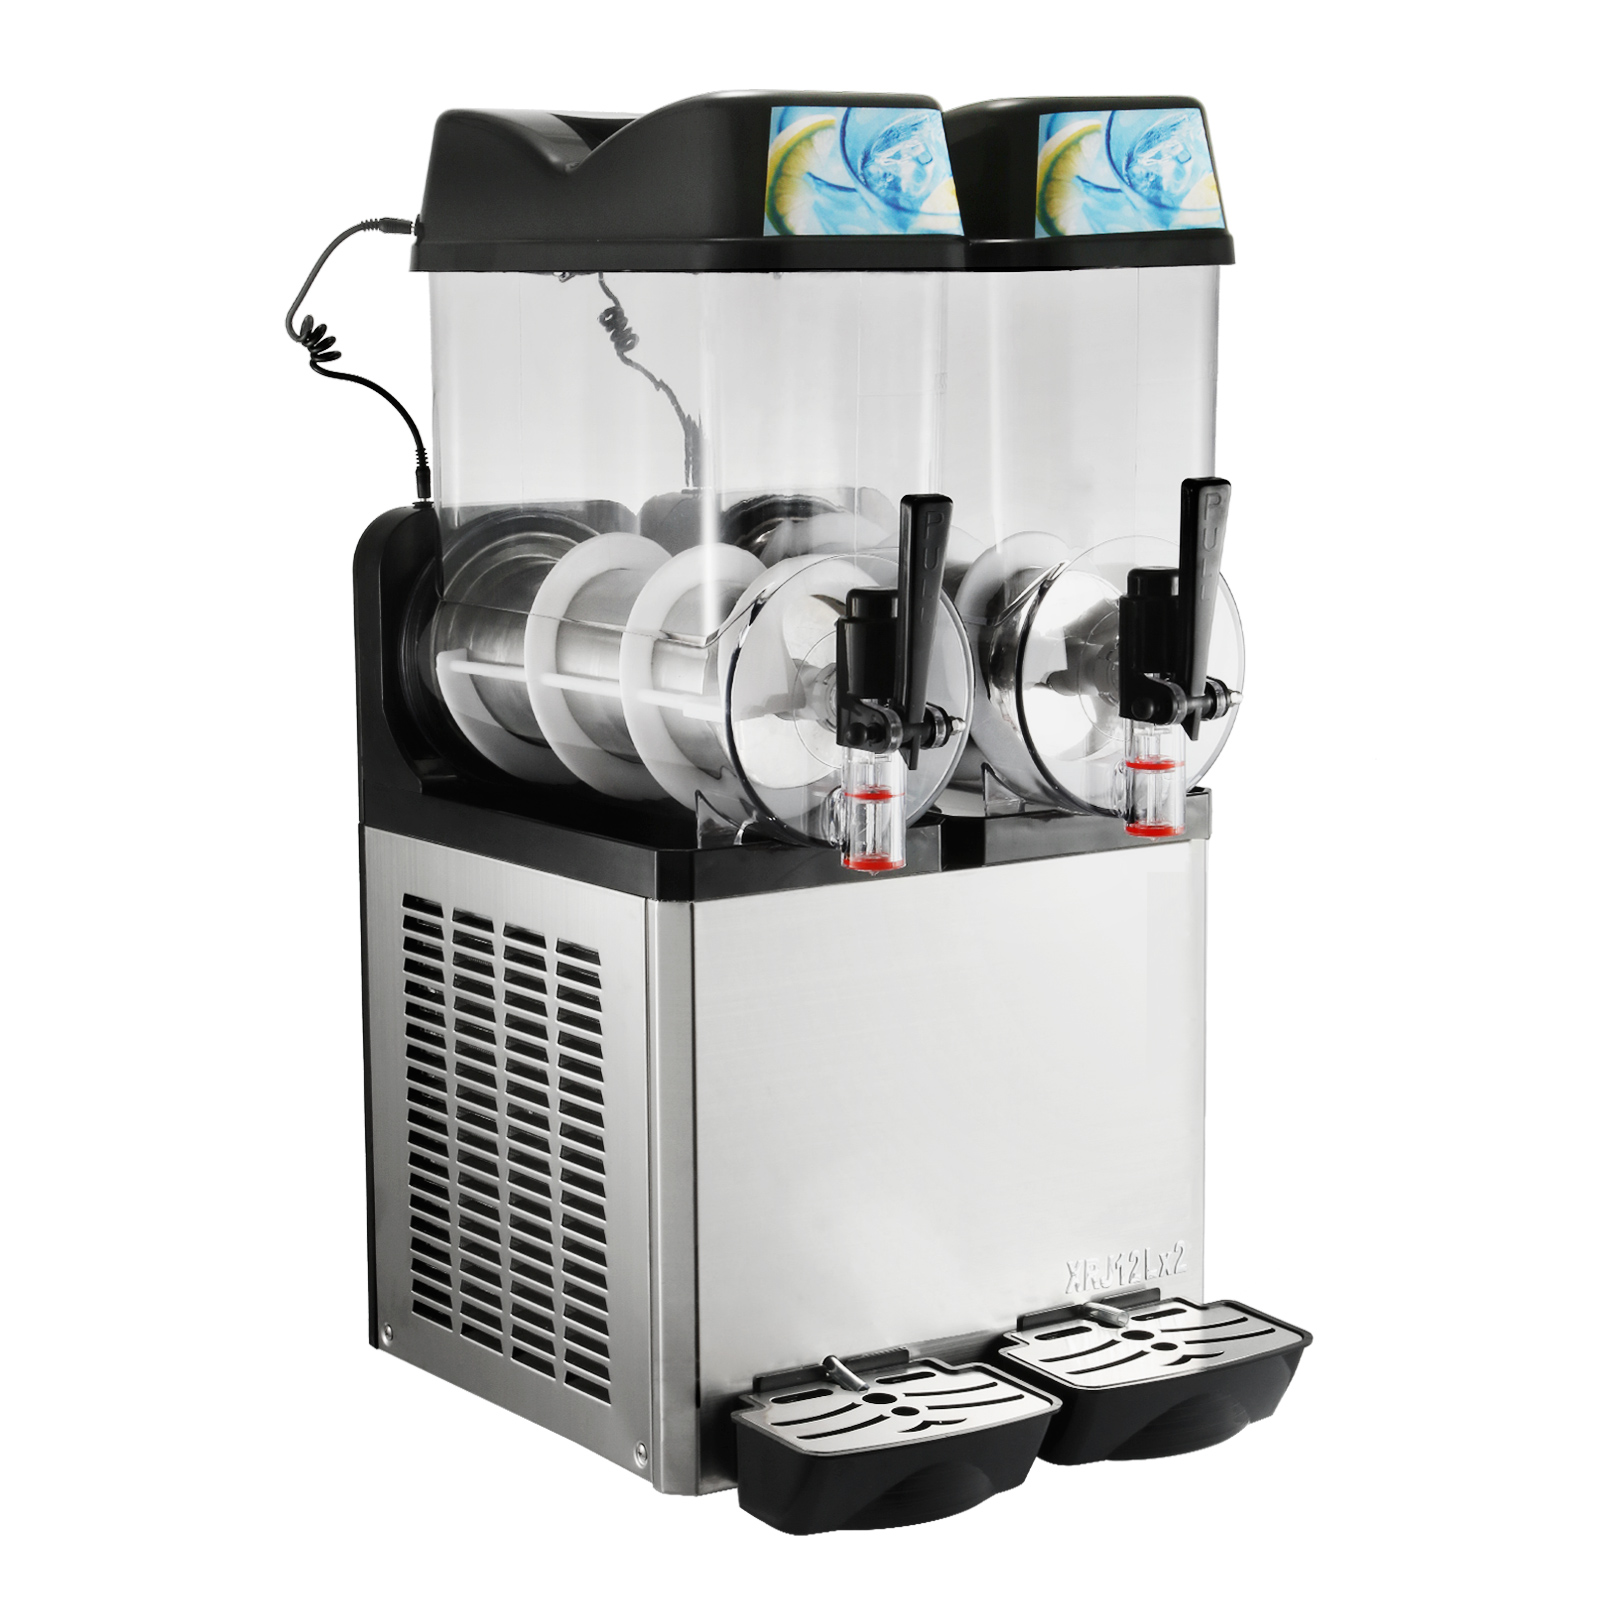 2×12L Commercial Frozen Drink Slush Slushy Machine Slurpee ...